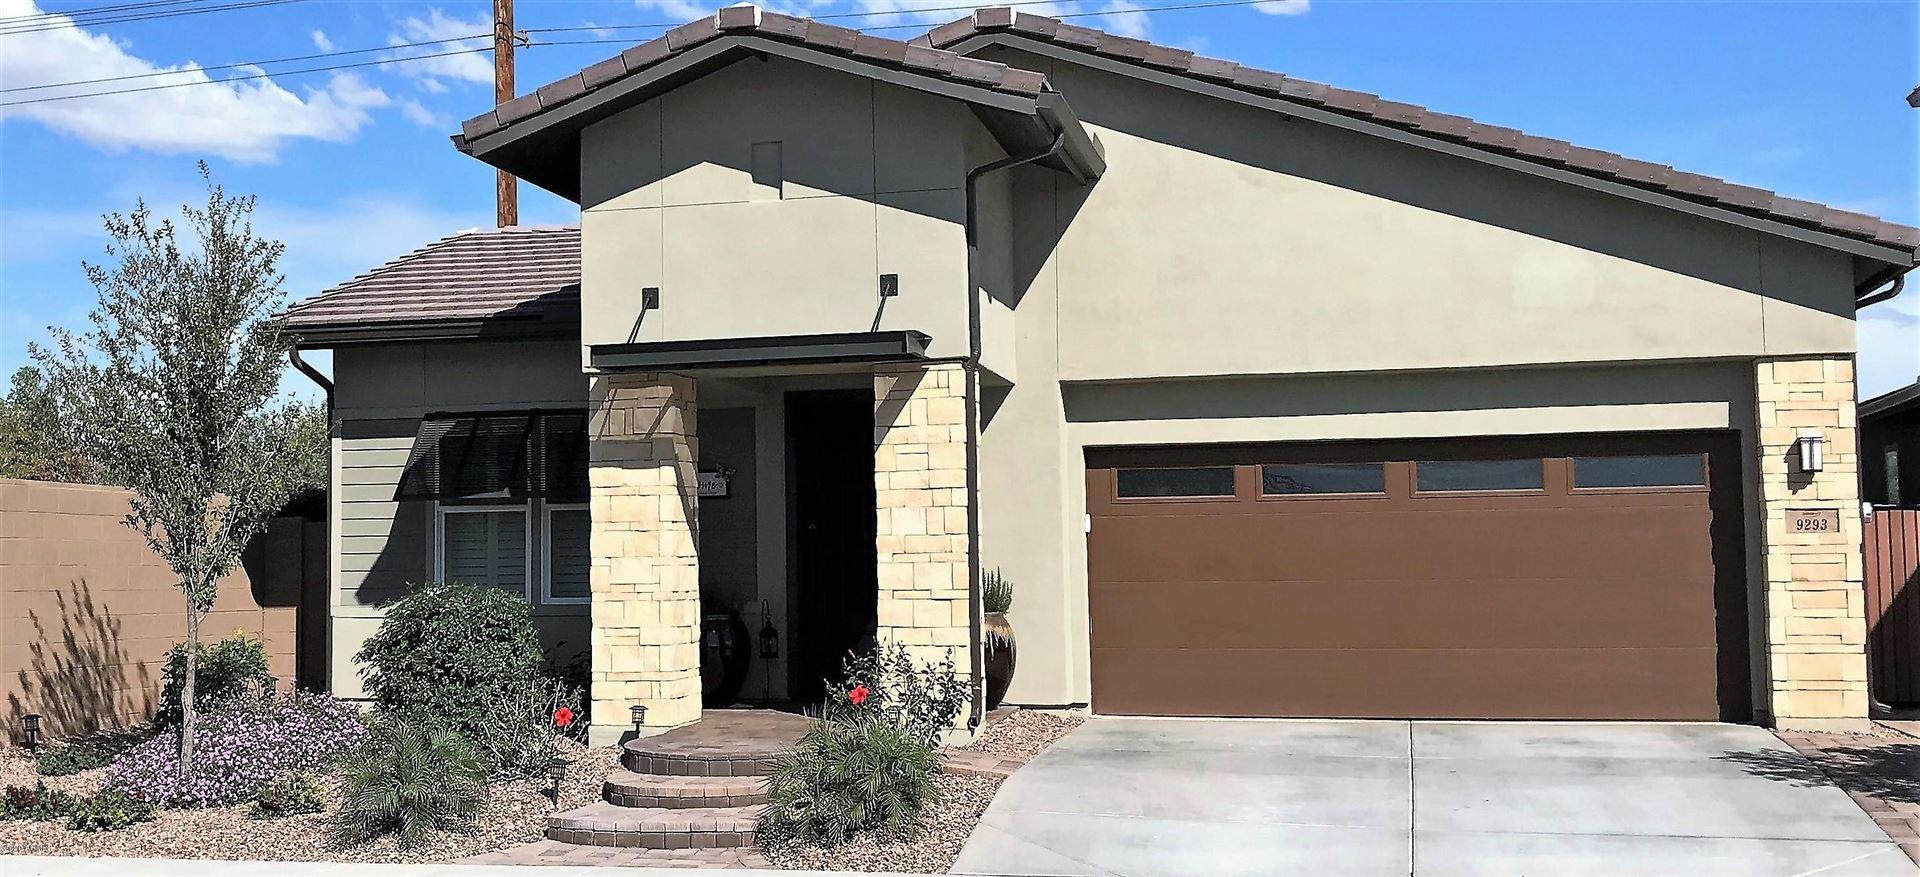 9293 S WALLY Avenue, Tempe, AZ 85284 - MLS#: 6055437